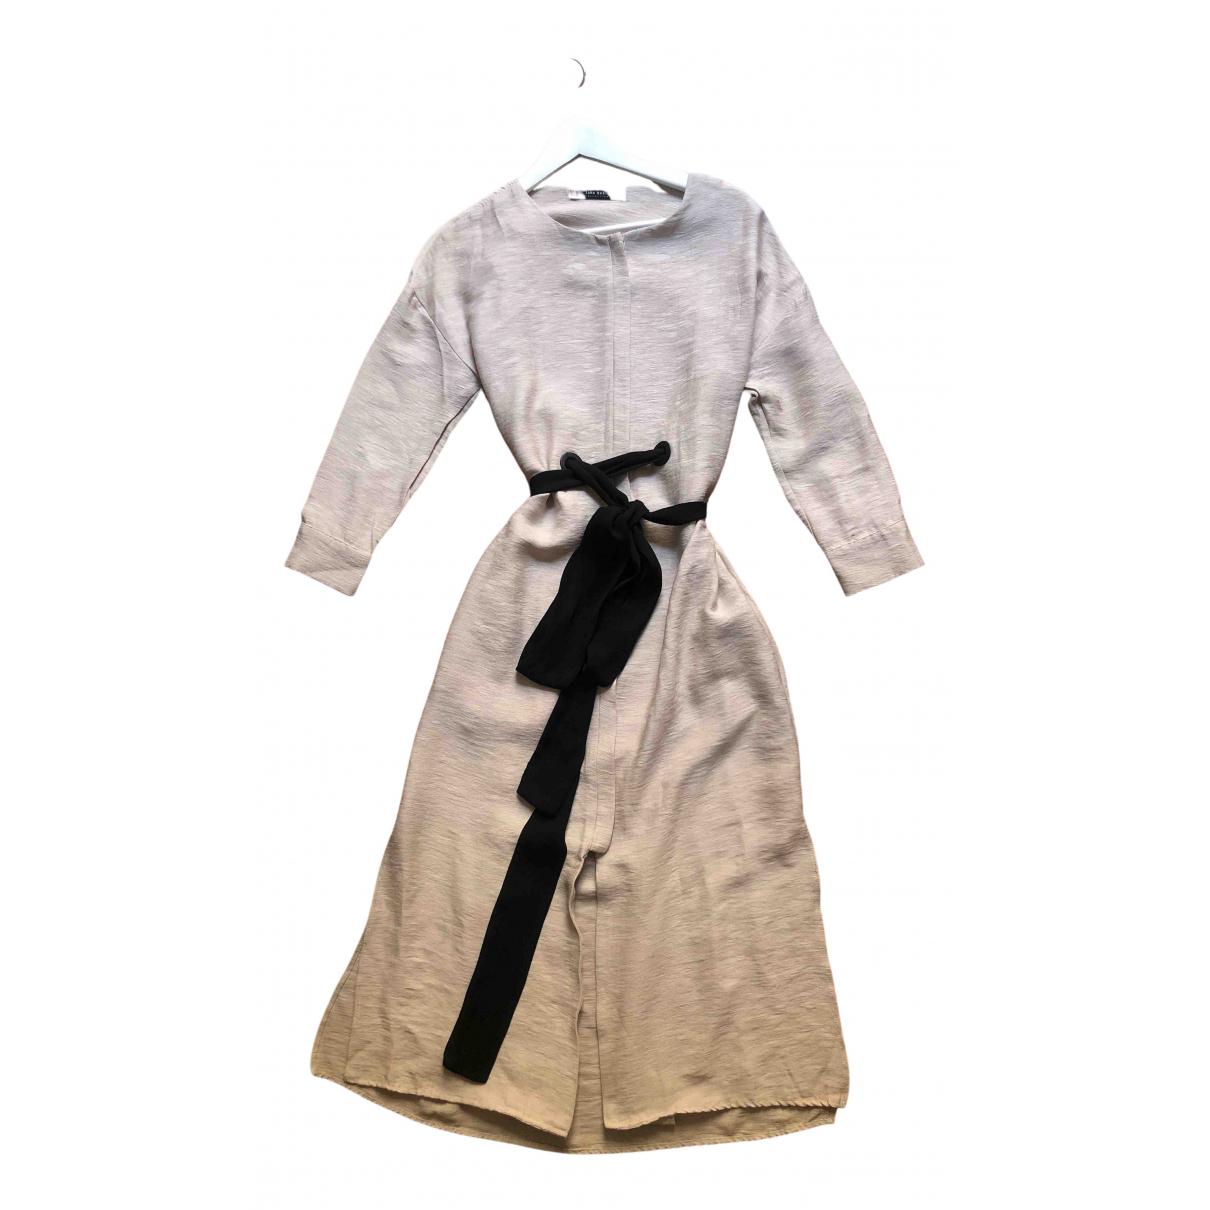 Zara \N Kleid in  Beige Leinen